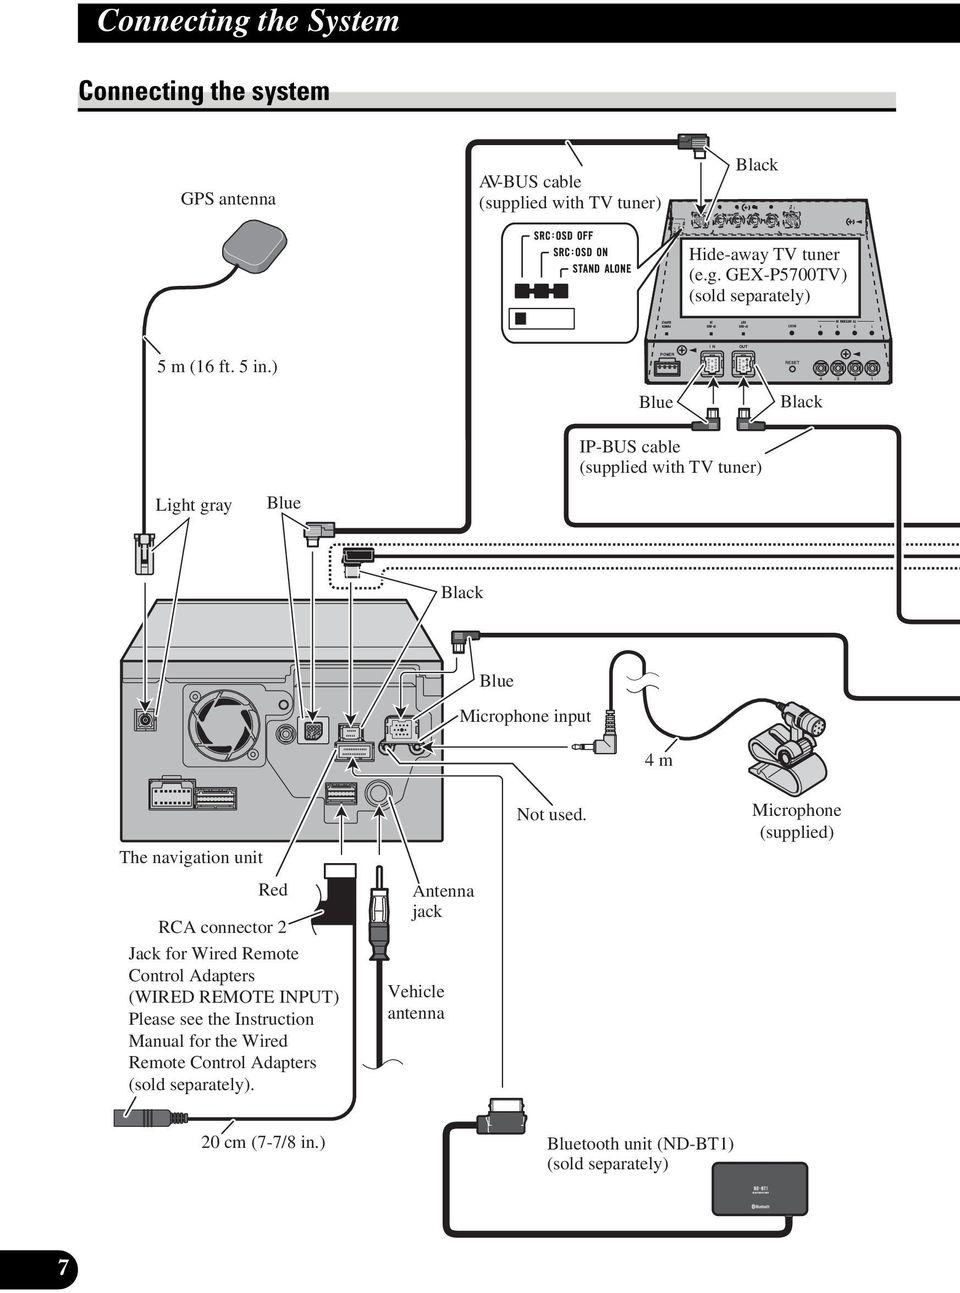 Remarkable Pioneer Avic Z2 Wiring Diagram Wiring Diagram Wiring Cloud Ostrrenstrafr09Org